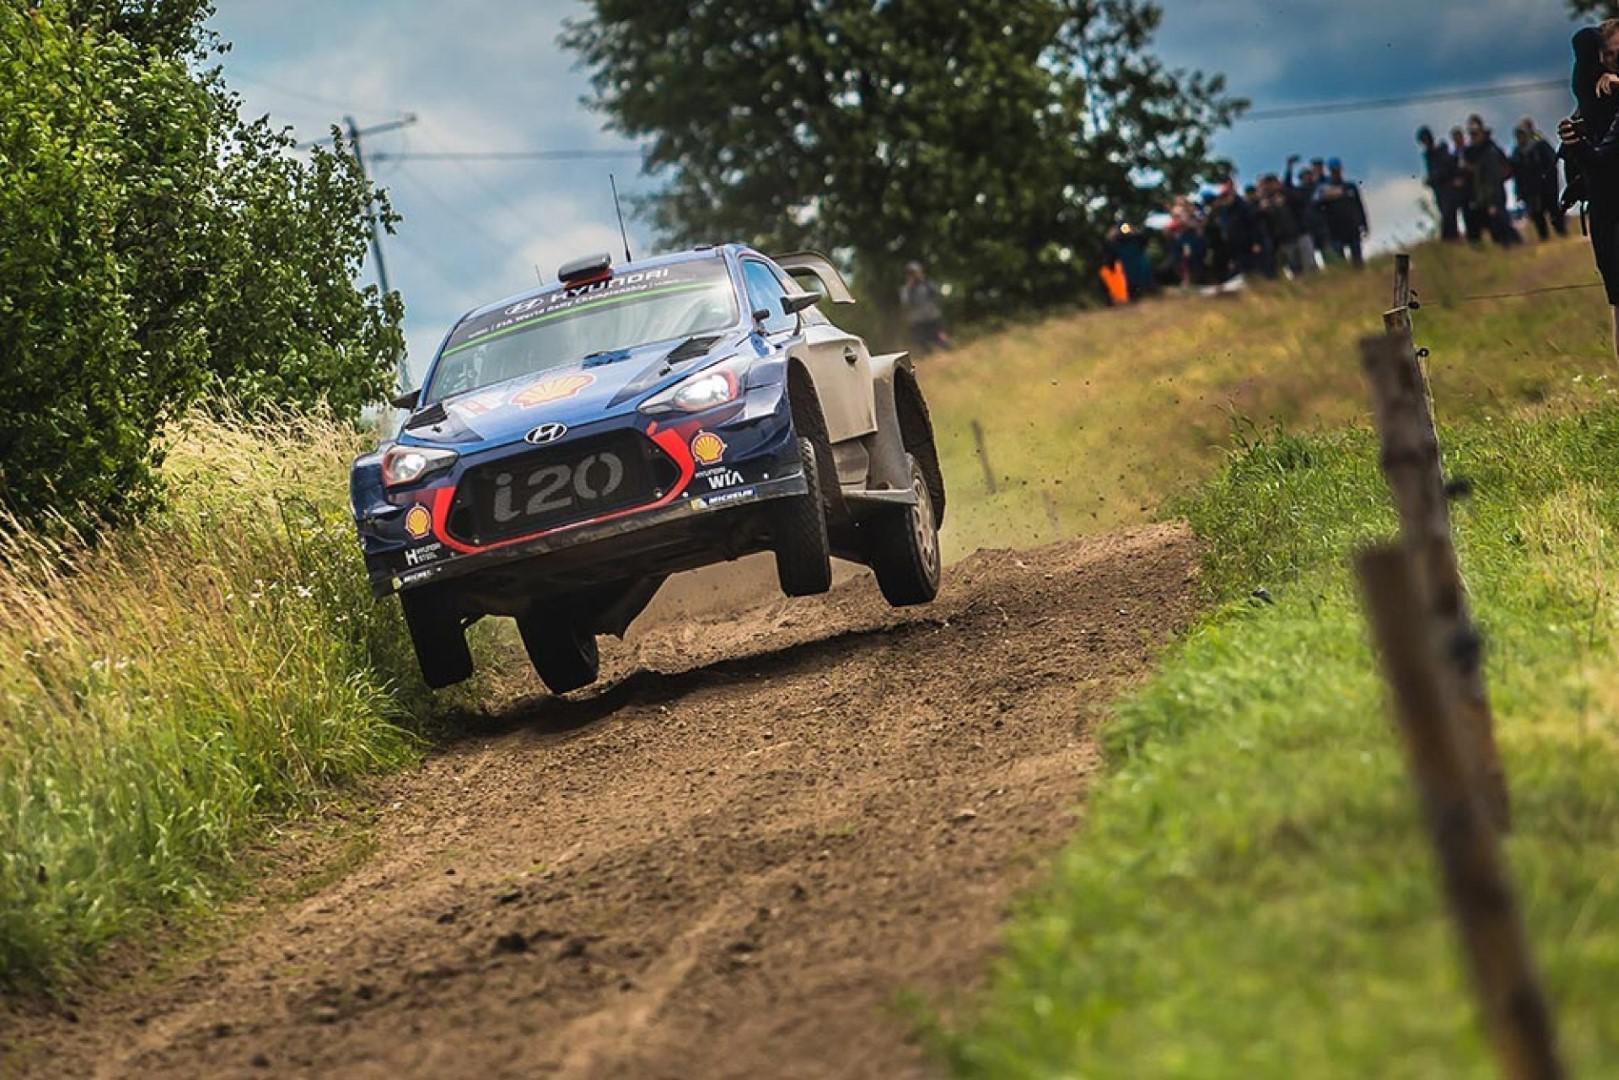 Rallye de Pologne : Thierry Neuville reprend les commandes du rallye